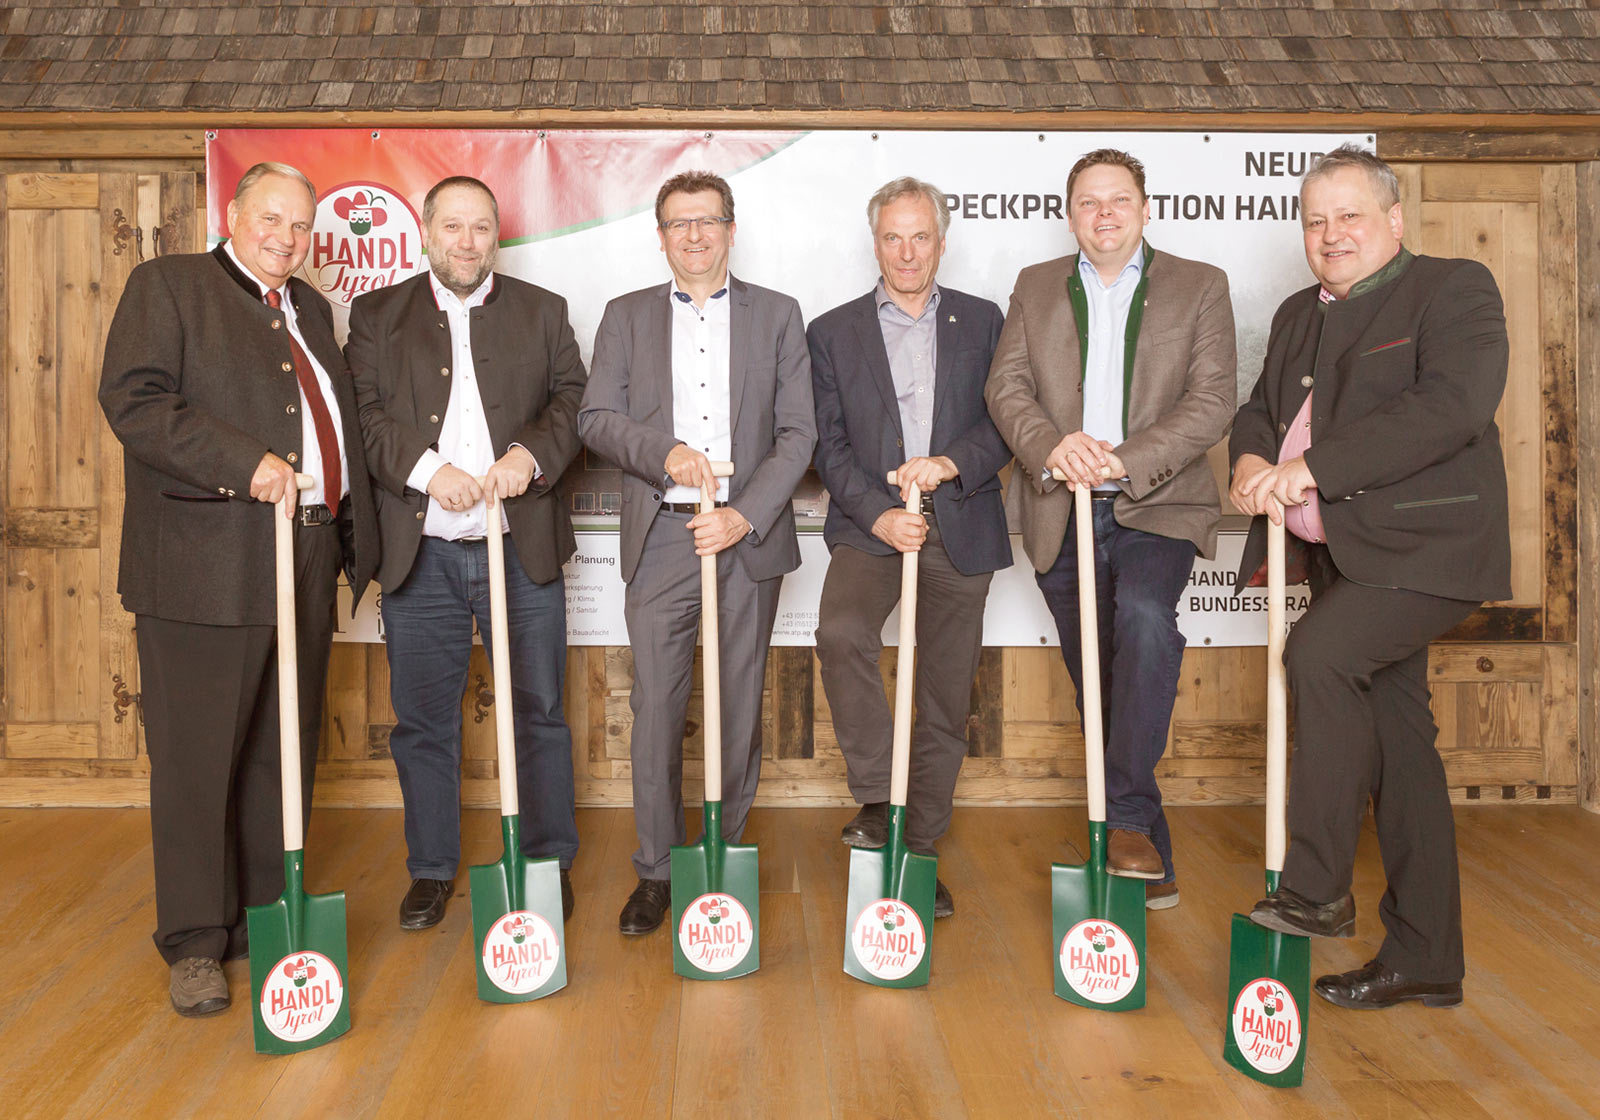 BU: v. l.: Karl Handl, Thomas Walde, GRL ATP Innsbruck, Gerald Hulka, GF ATP Innsbruck, Josef Ascher, Prokurist Fröschl, Christian Handl und Bürgermeister Josef Leitner